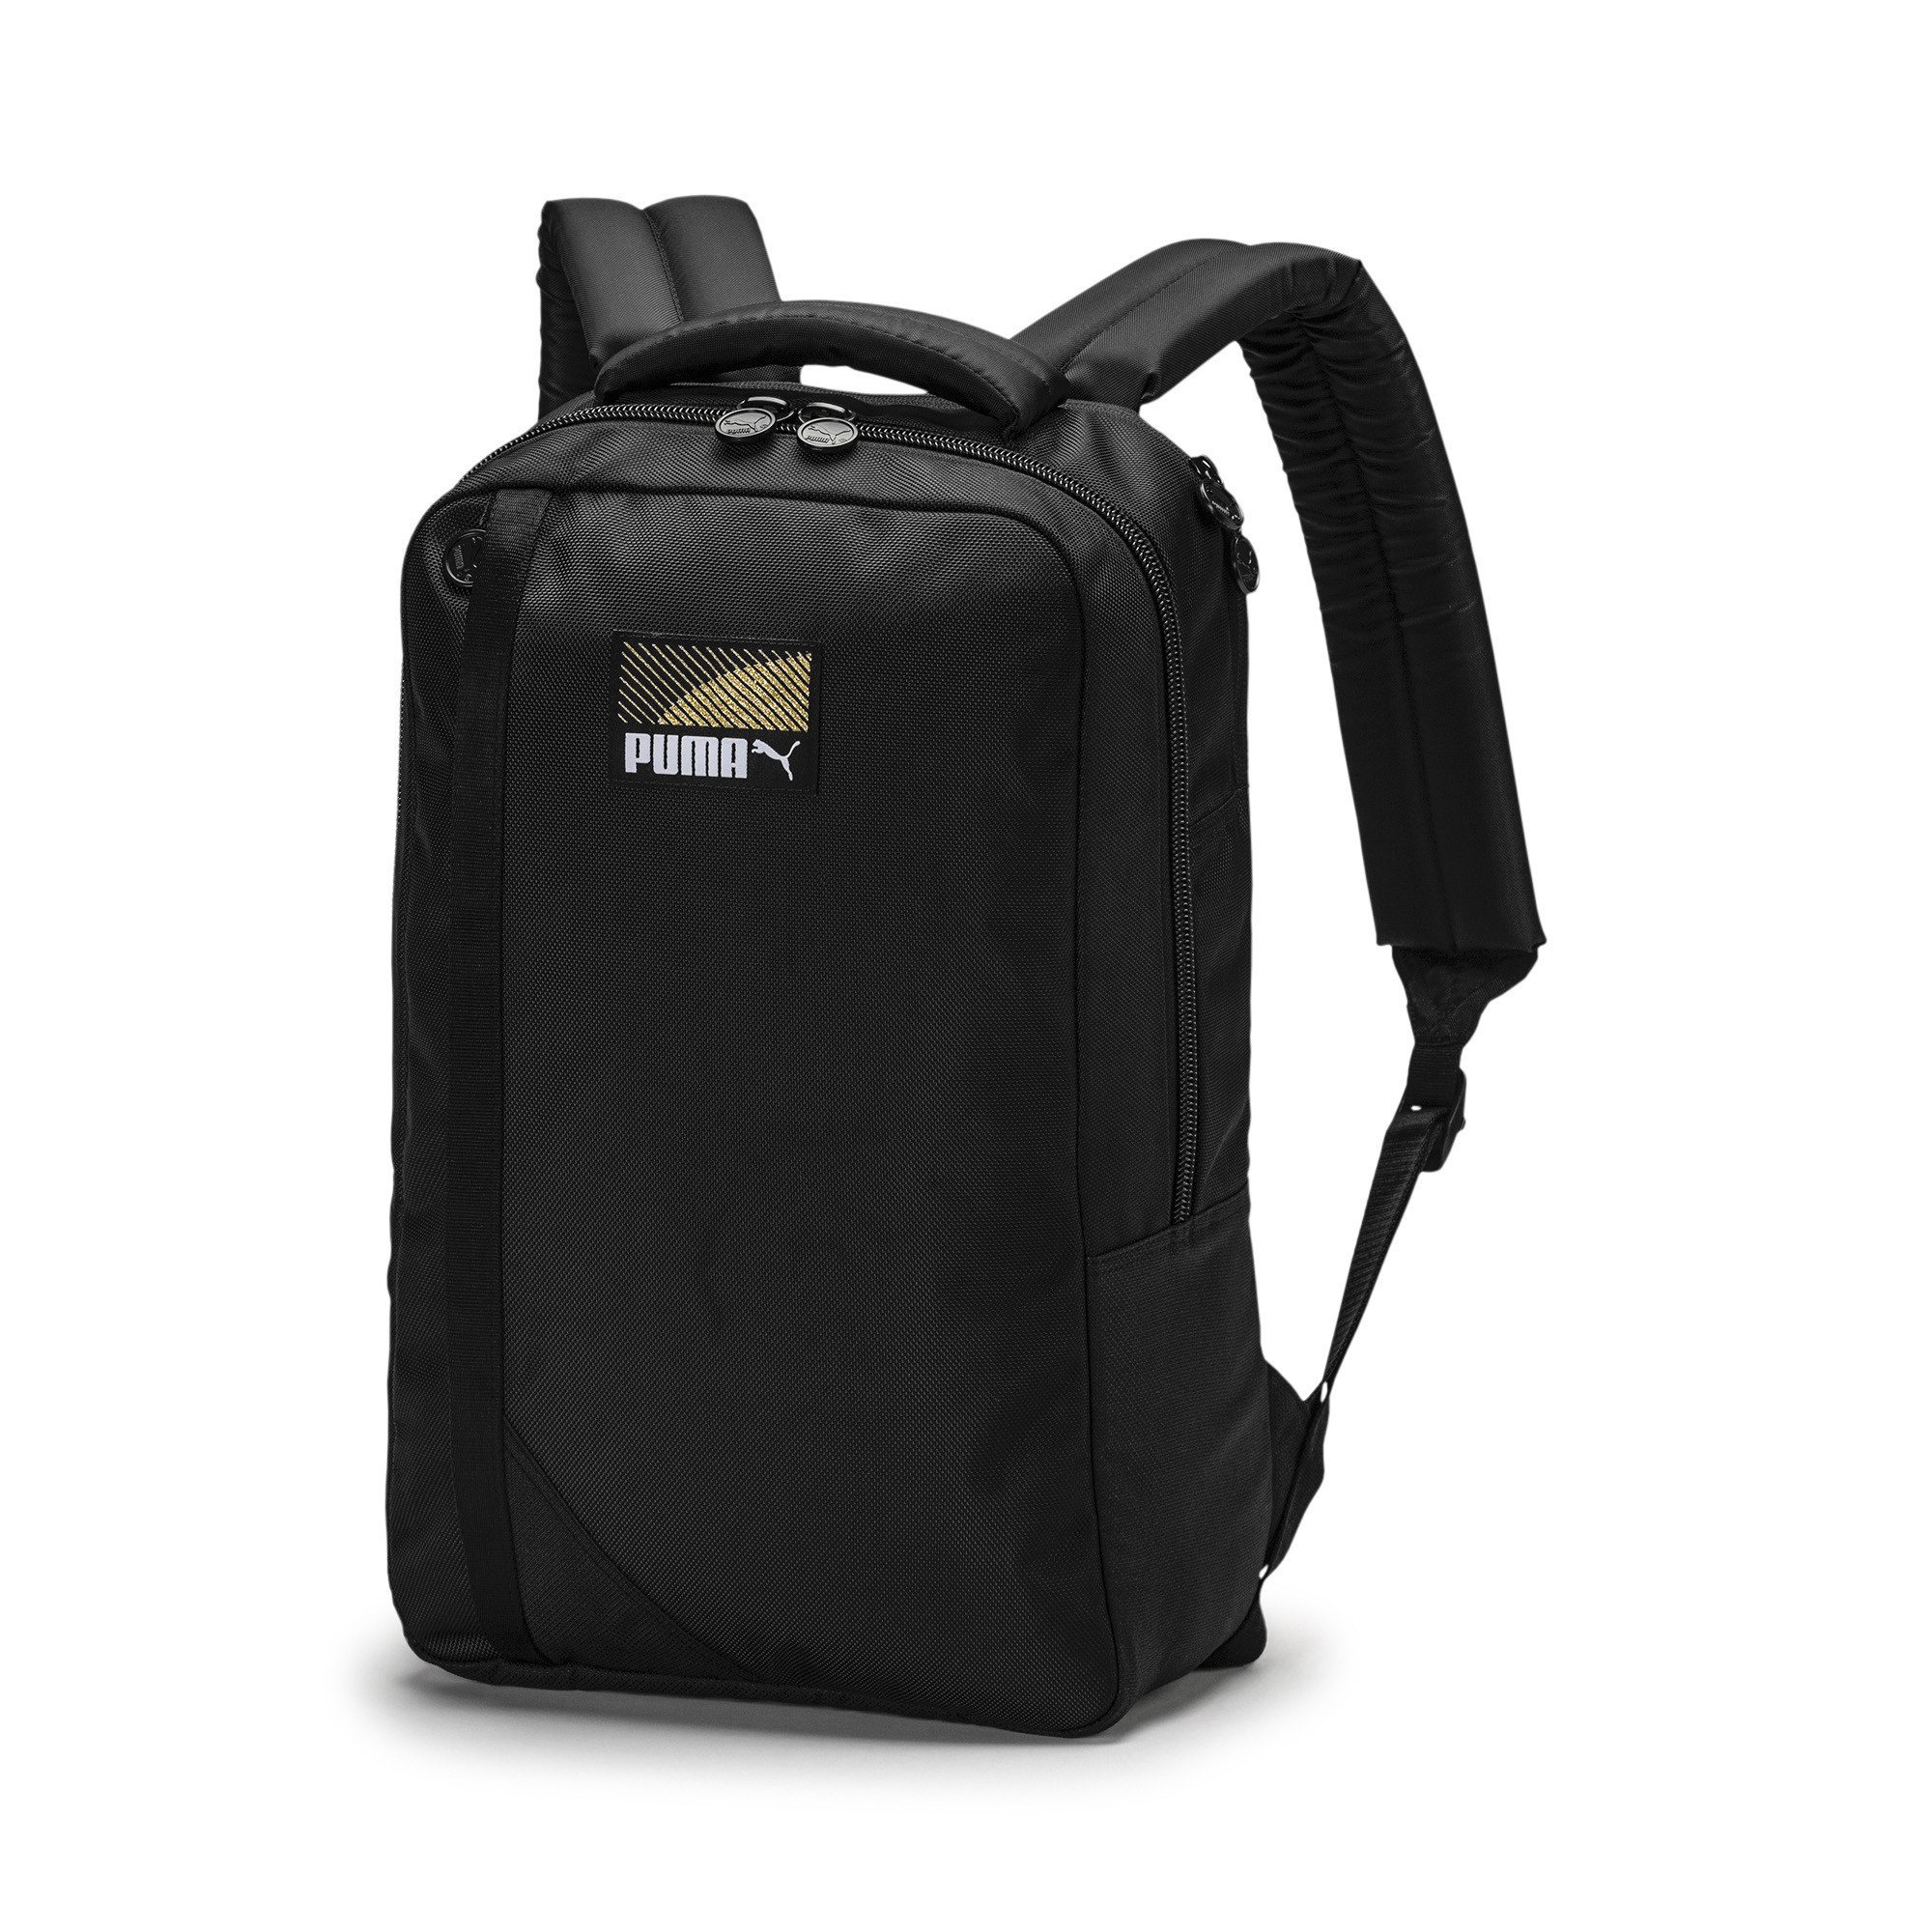 b1ea235f1e Backpacks & Bags - Accessories - Womens